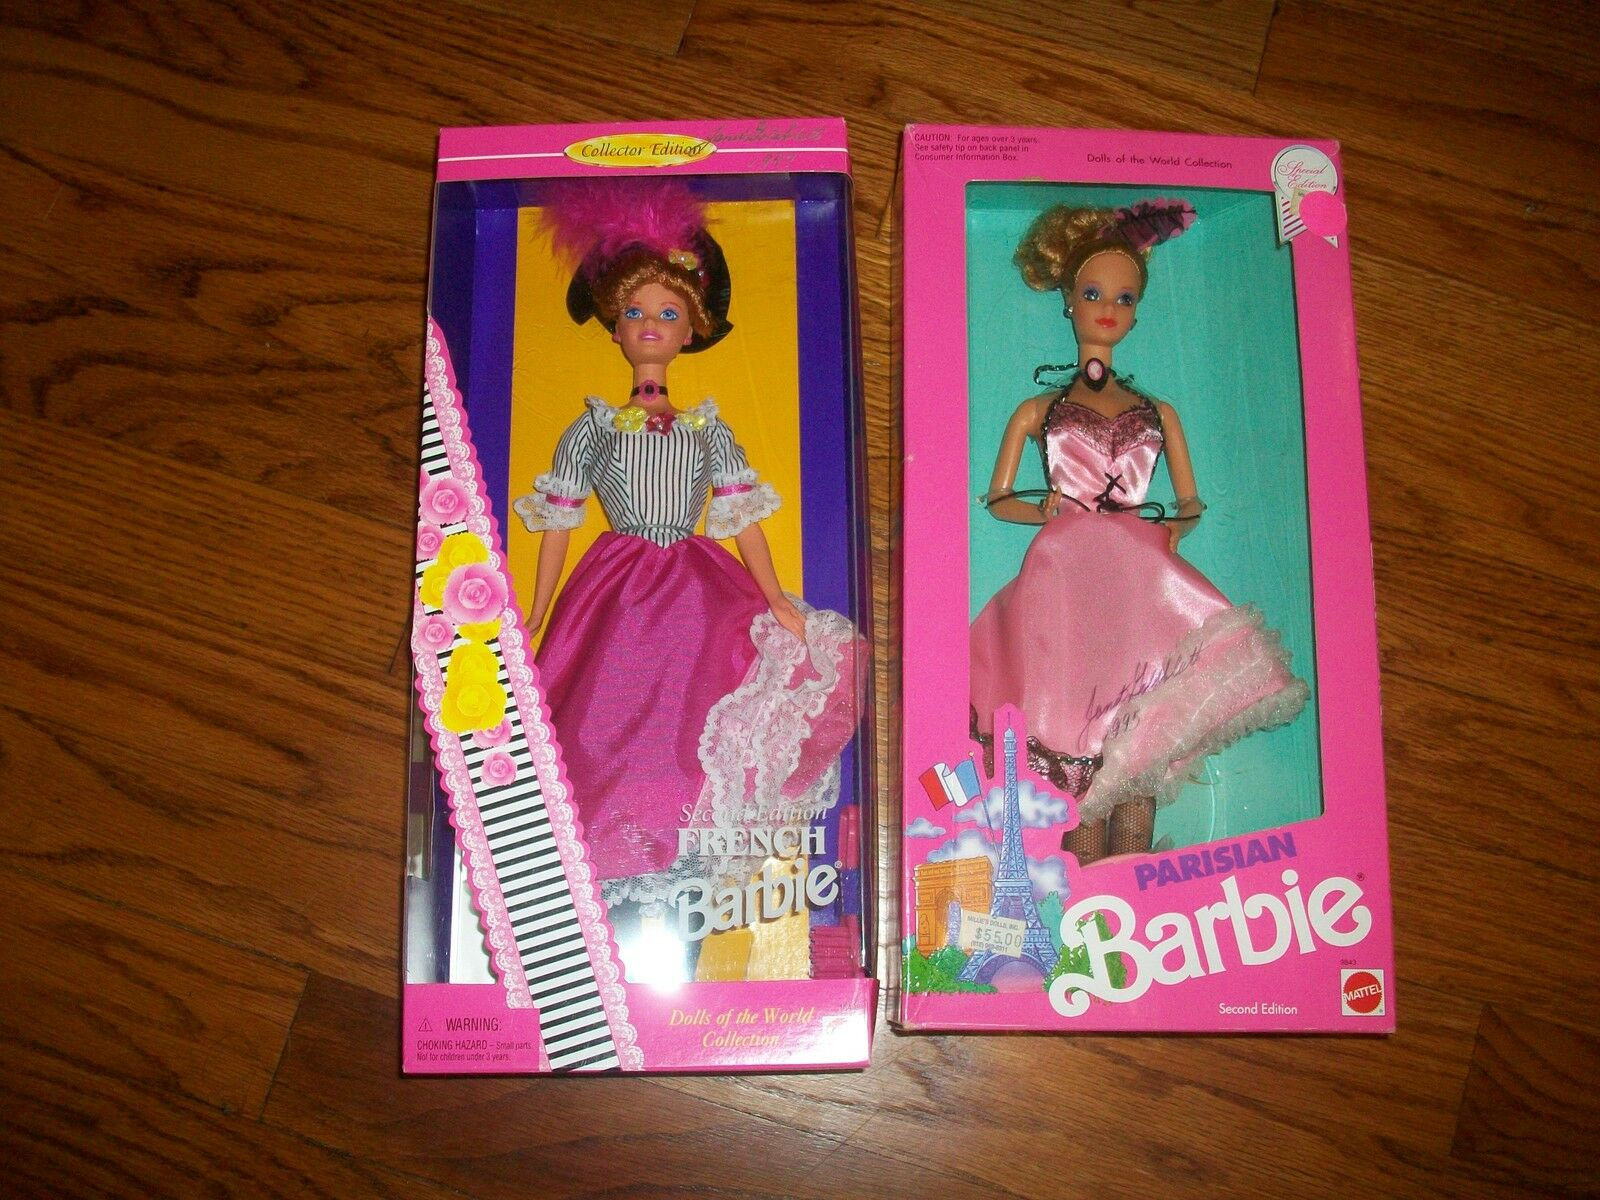 Lote de 2 Muñecas Barbie francesa del mundo 1997 & parisino Barbie ambos firmados